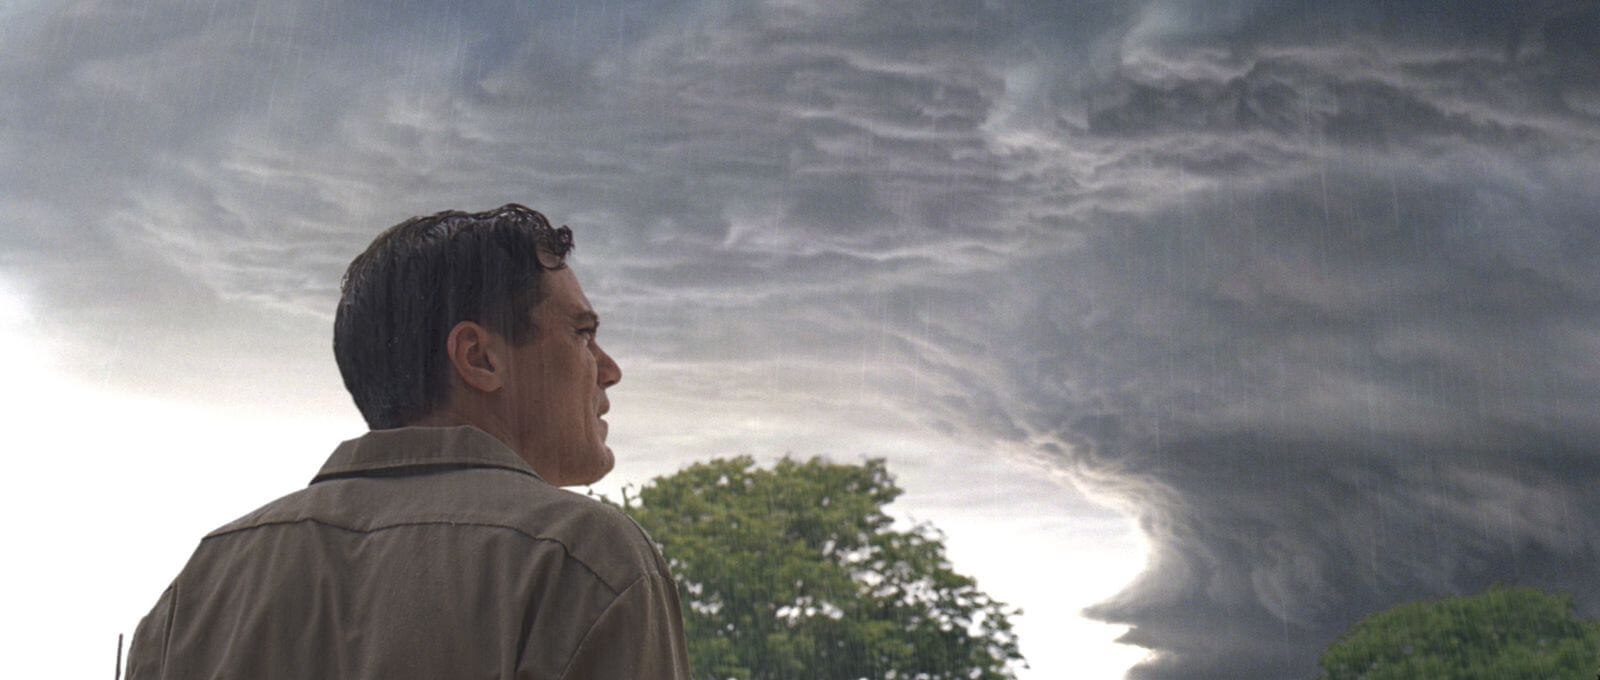 Hombre mirando a las nubes oscuras del cielo pelicula take shelter